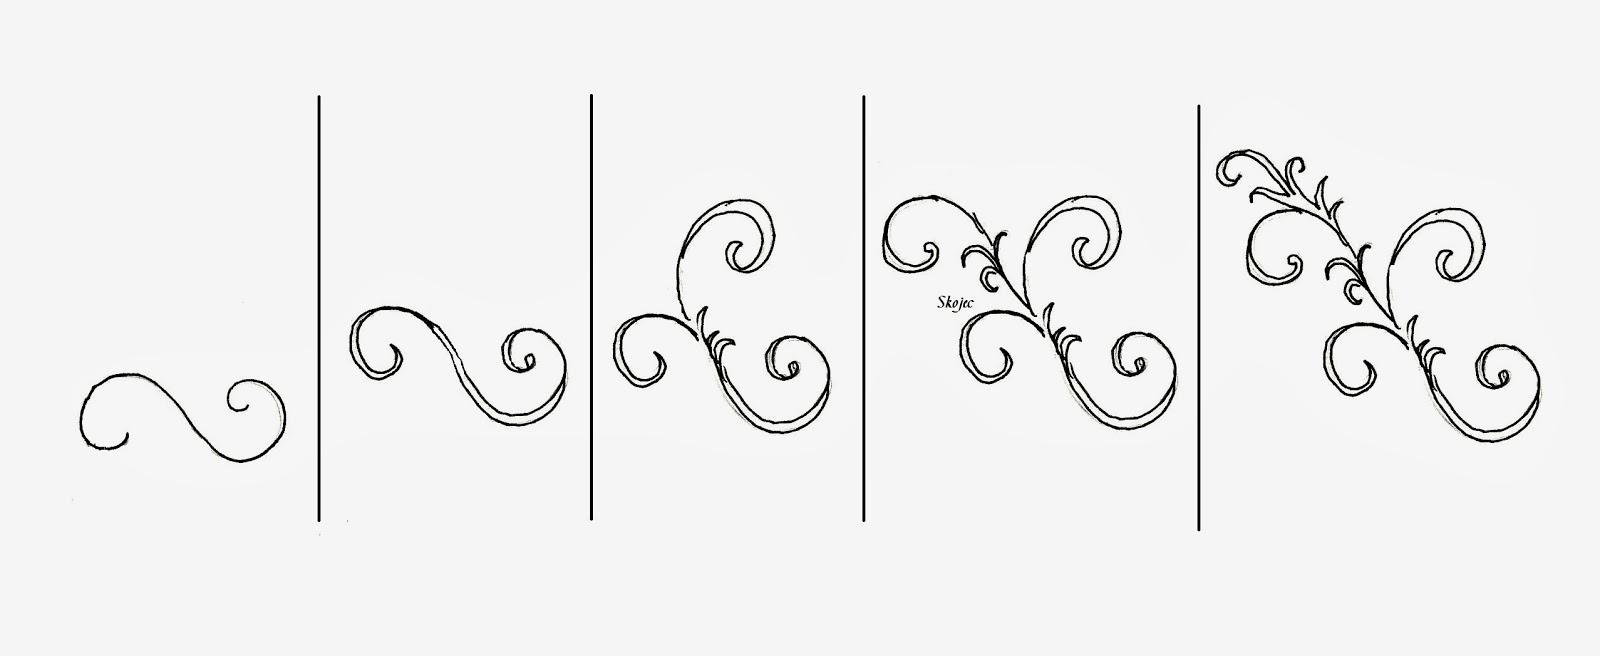 Drawn scroll swirl Scrolls Ideas upright How to